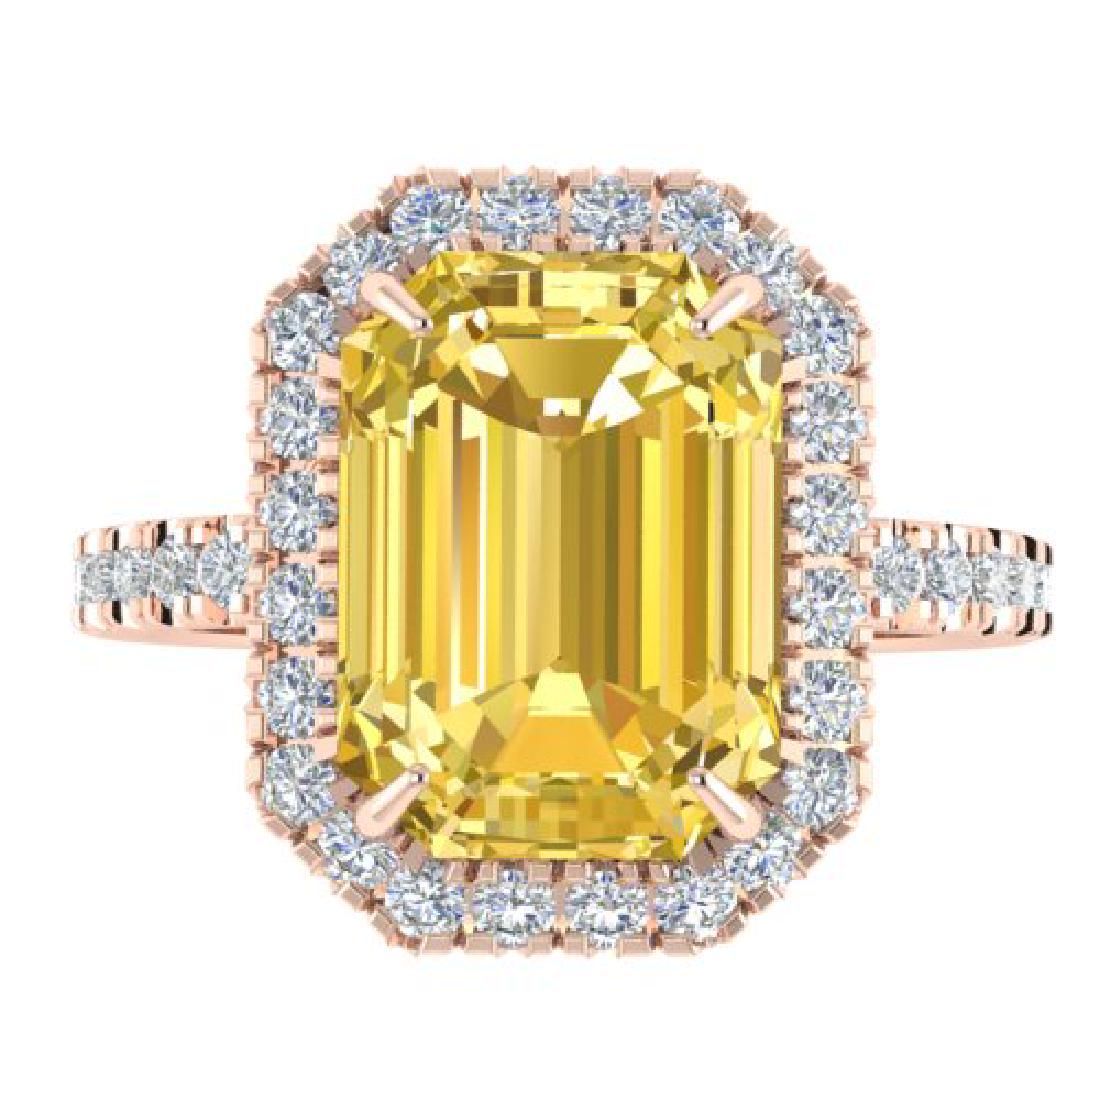 450 CTW Citrine And Micro Pave VSSI Diamond Halo Ring